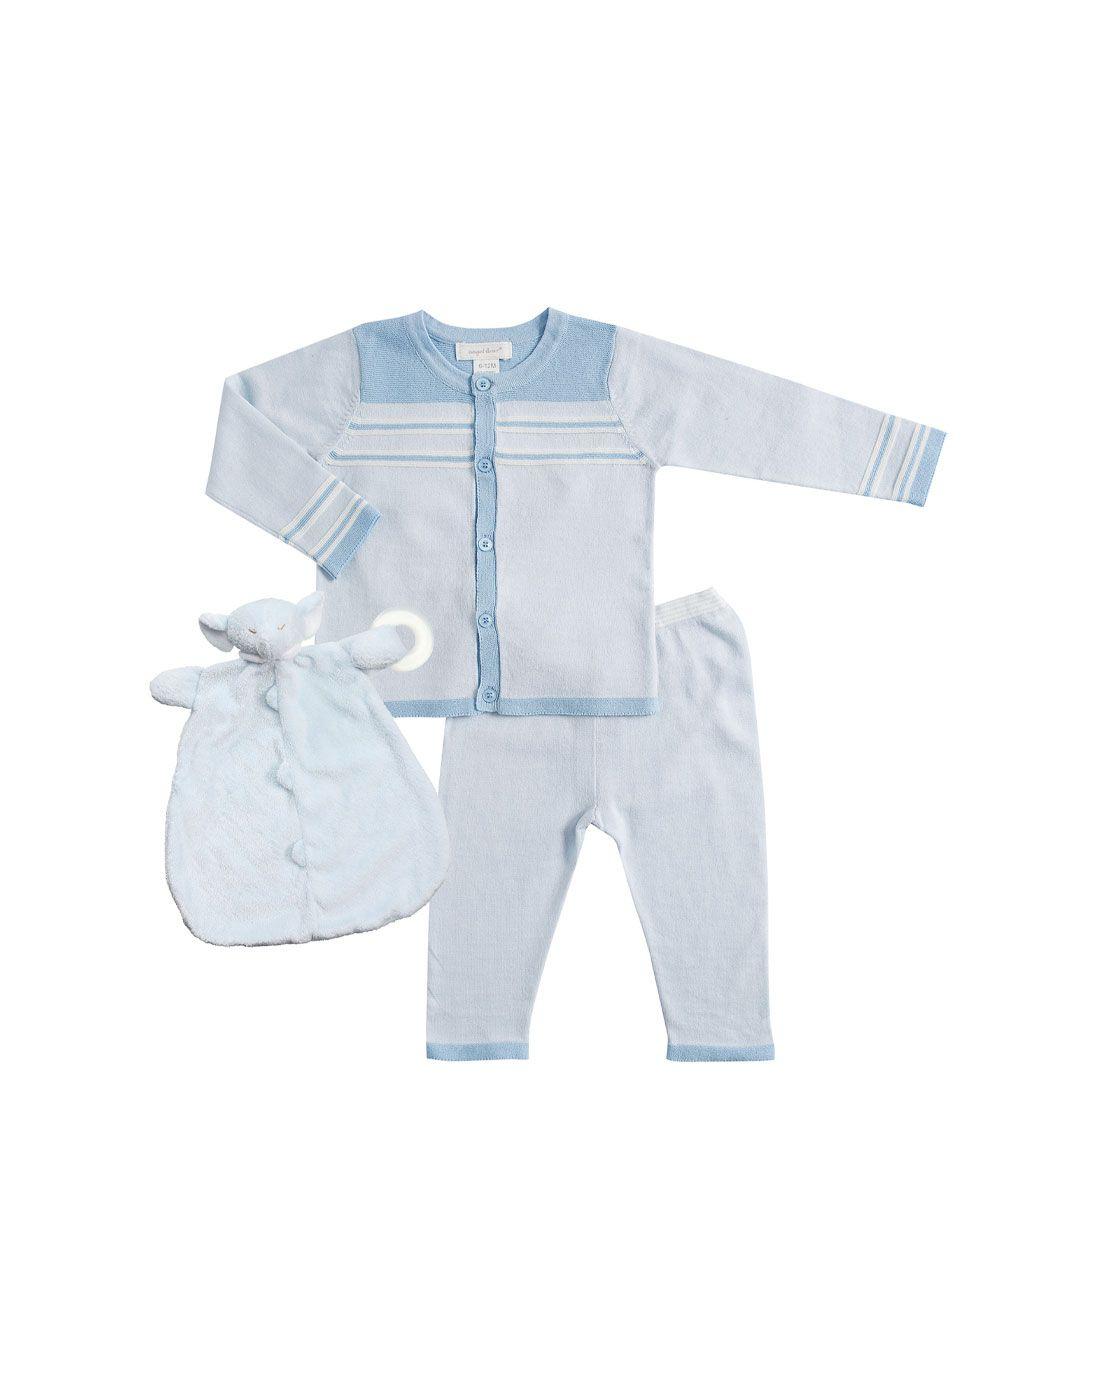 Angel Dear细针毛衣开衫裤子套装蓝色和蓝色大象牙胶